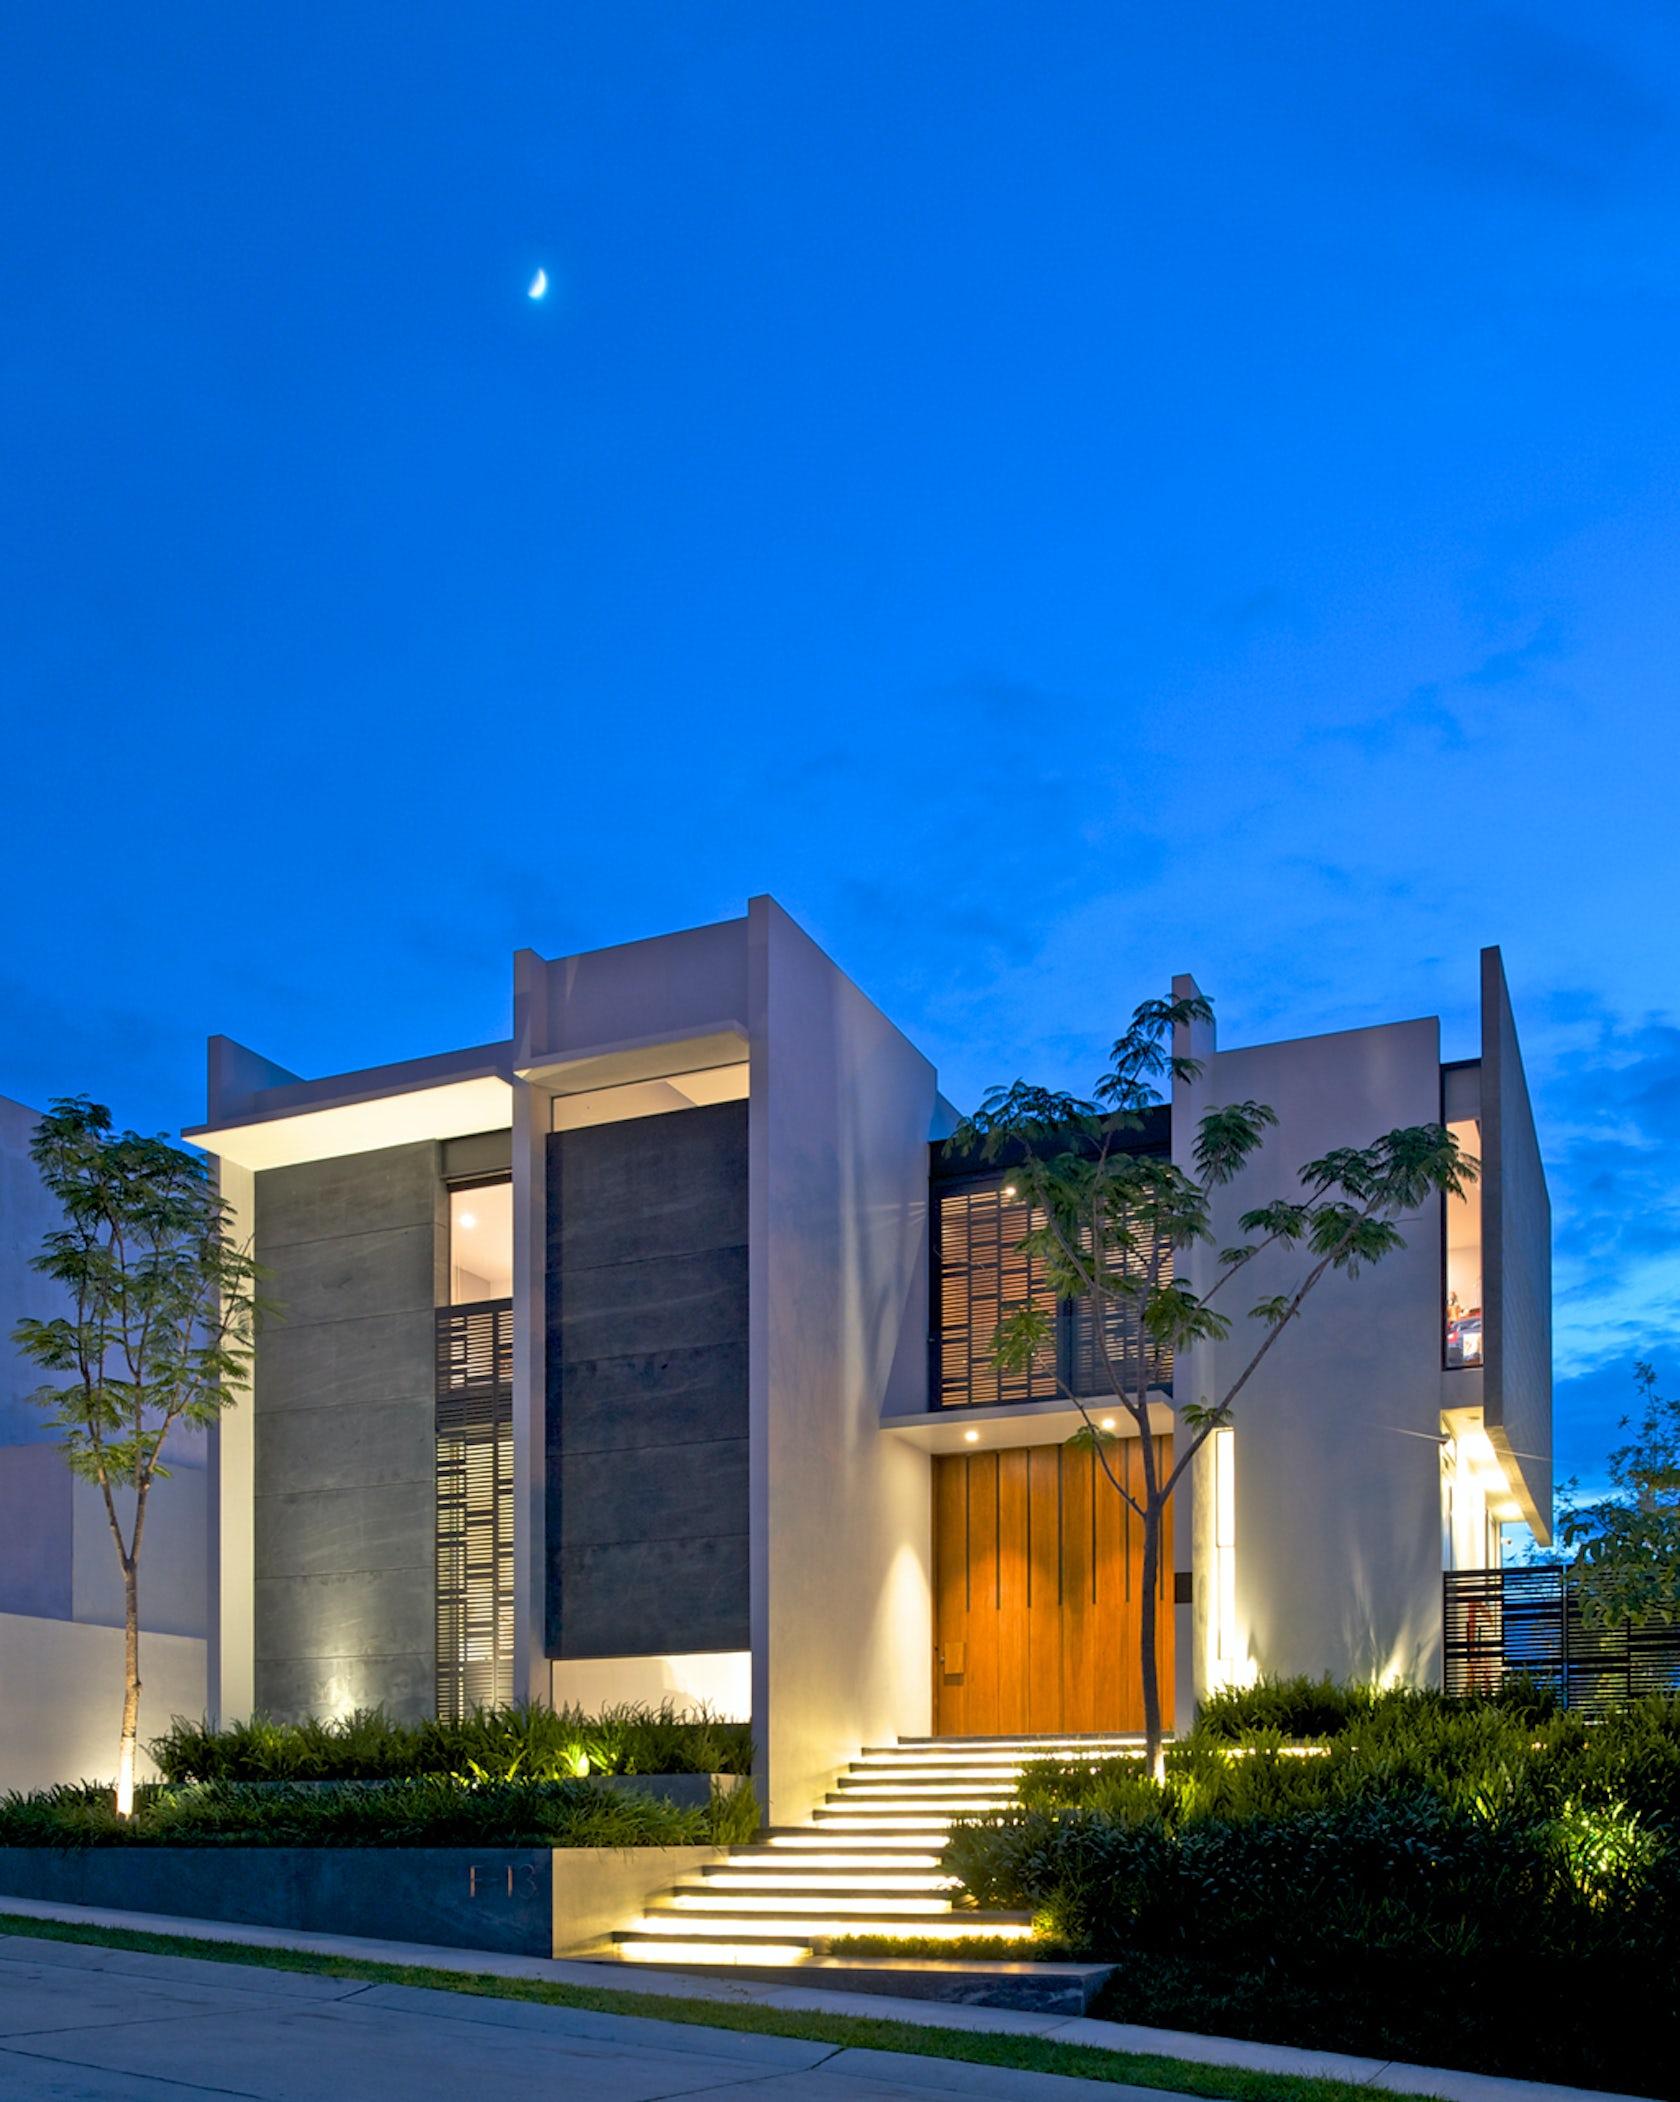 Agraz arquitectos s c architizer for Casa moderna immagini